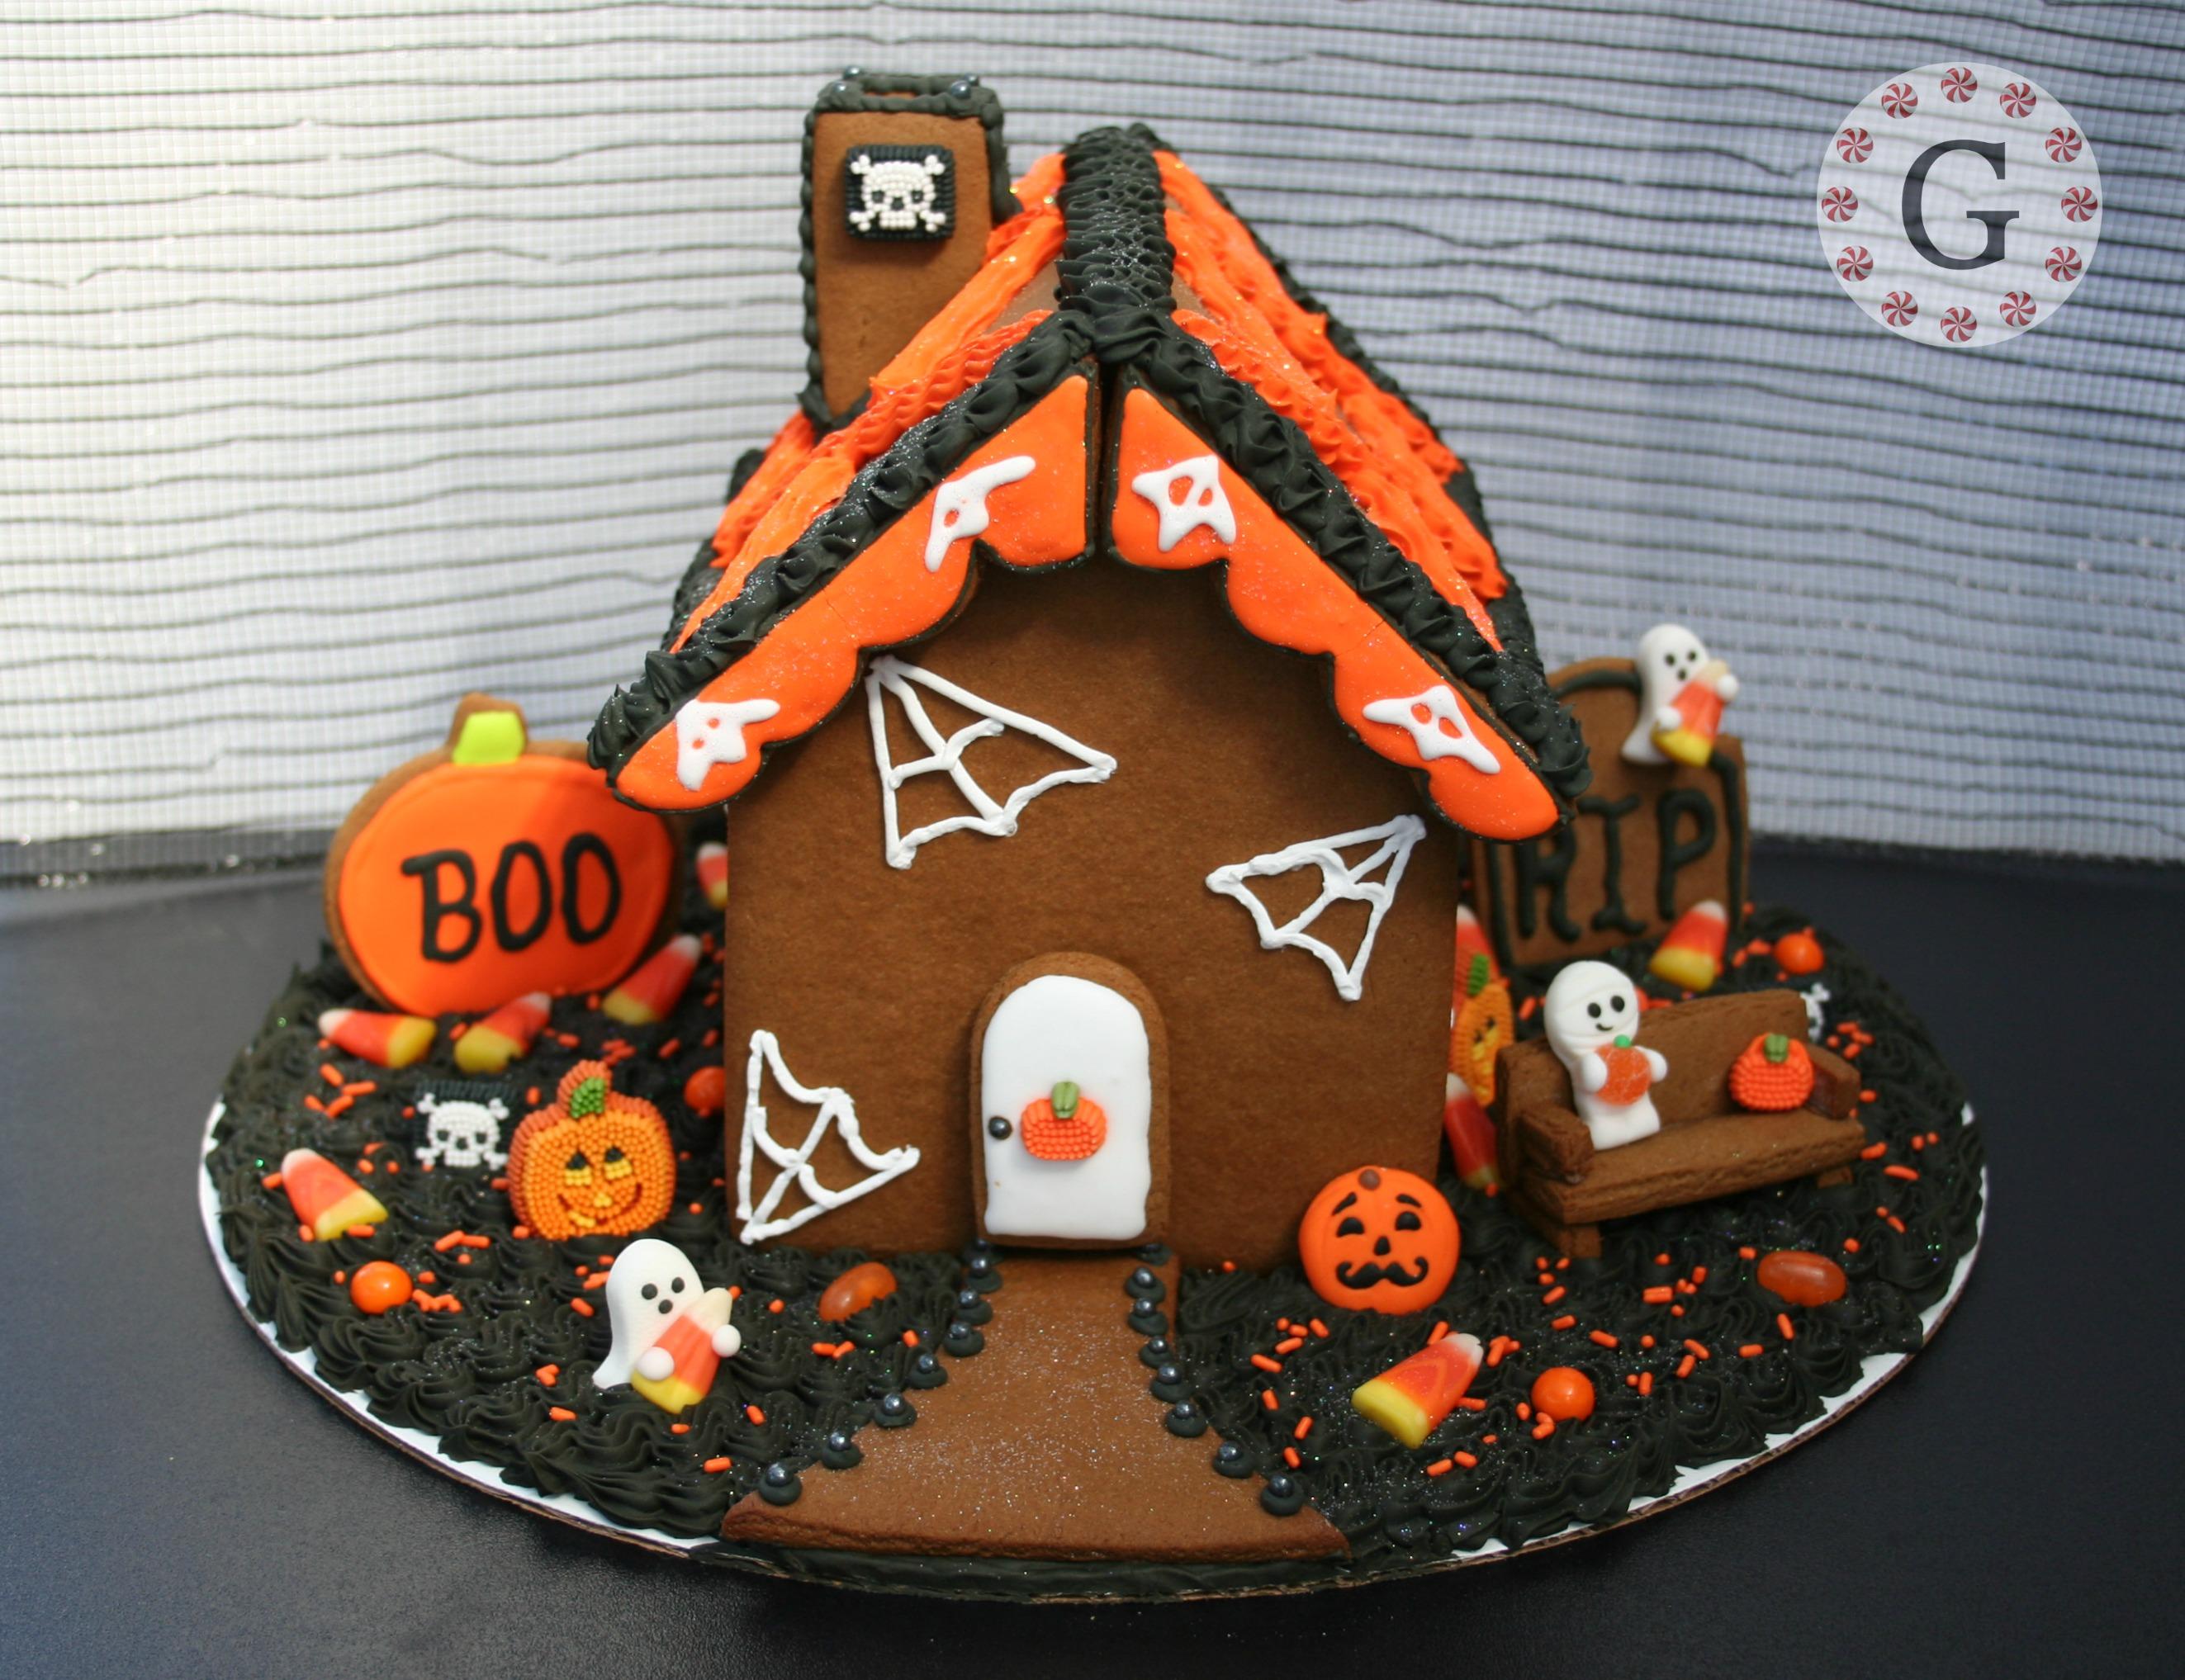 Decoración de torta por halloween - 2646x2035